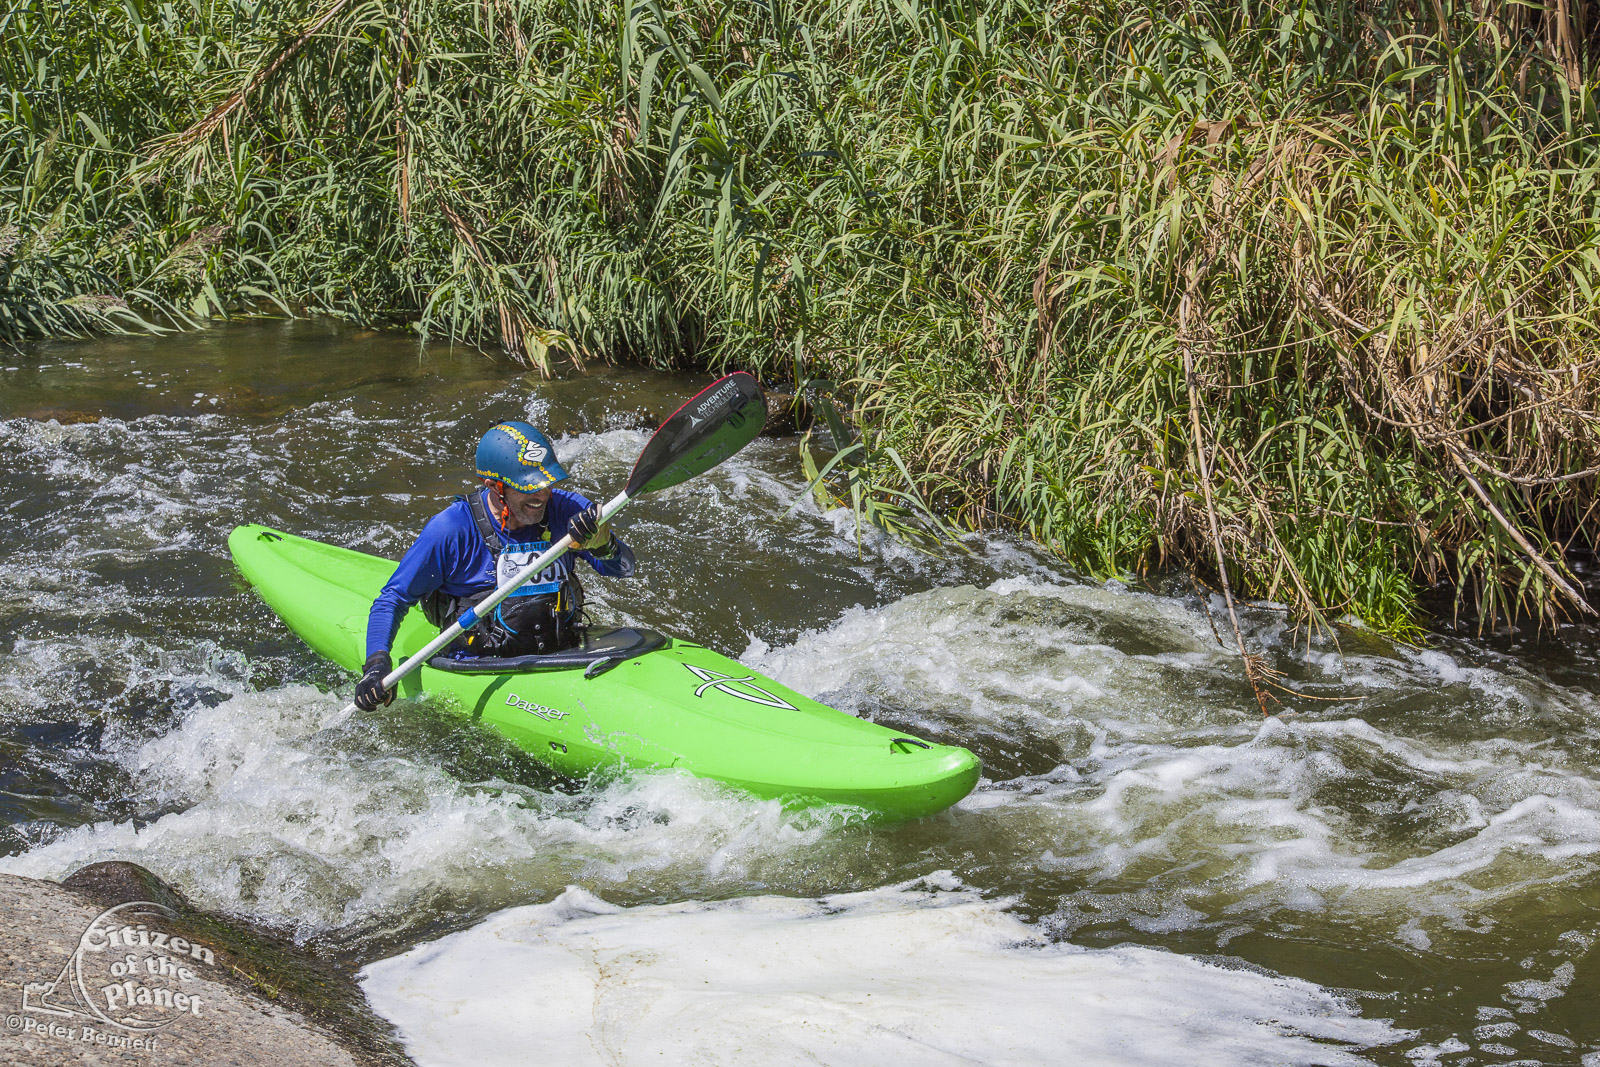 US_CA_48_3845_la_river_boat_race.jpg